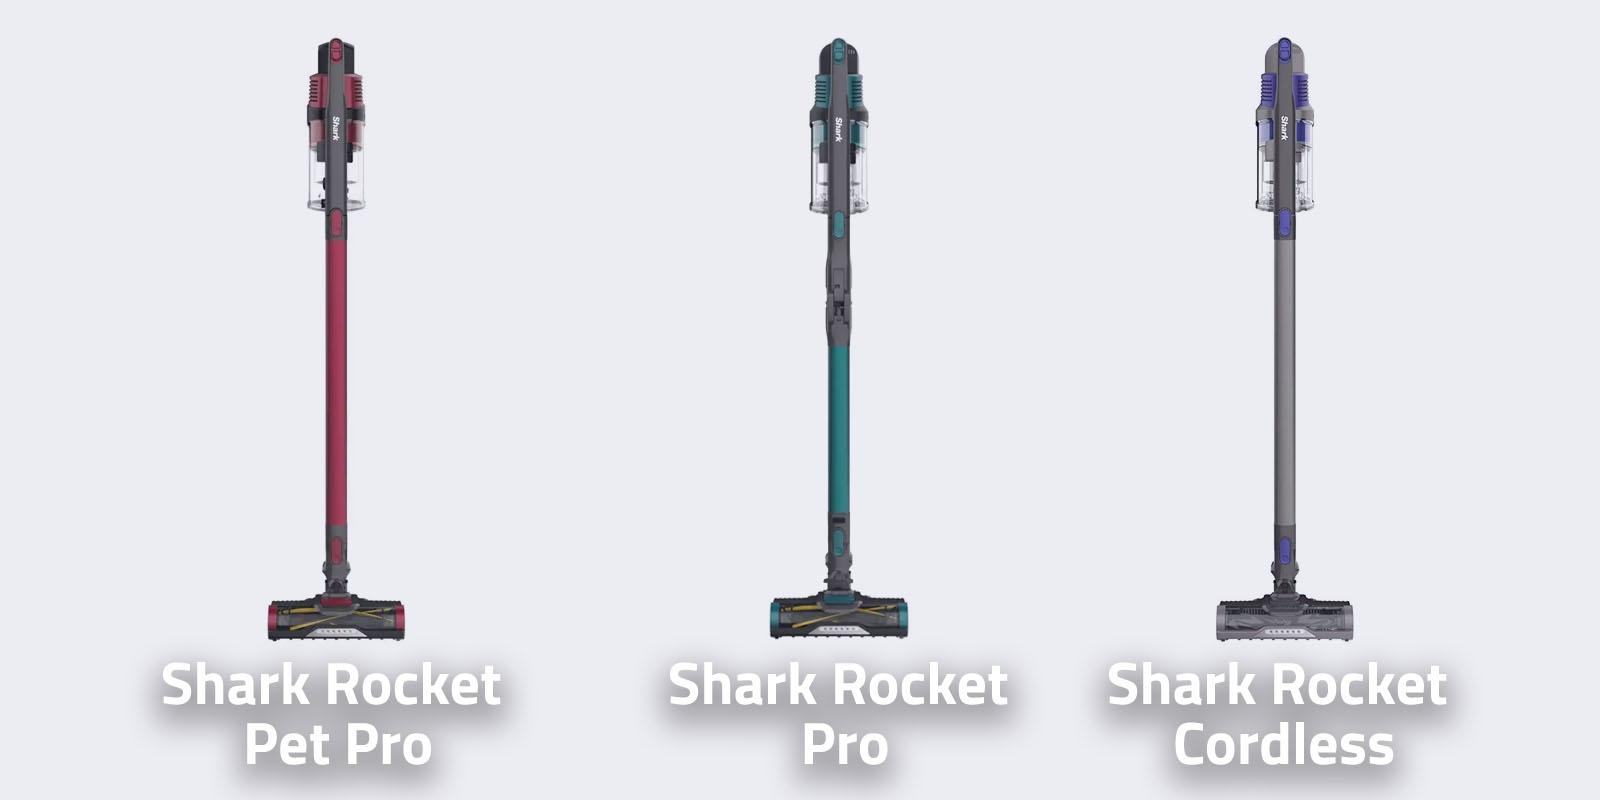 Shark Rocket Pet Pro vs Shark Rocket Pro vs Shark Rocket Cordless